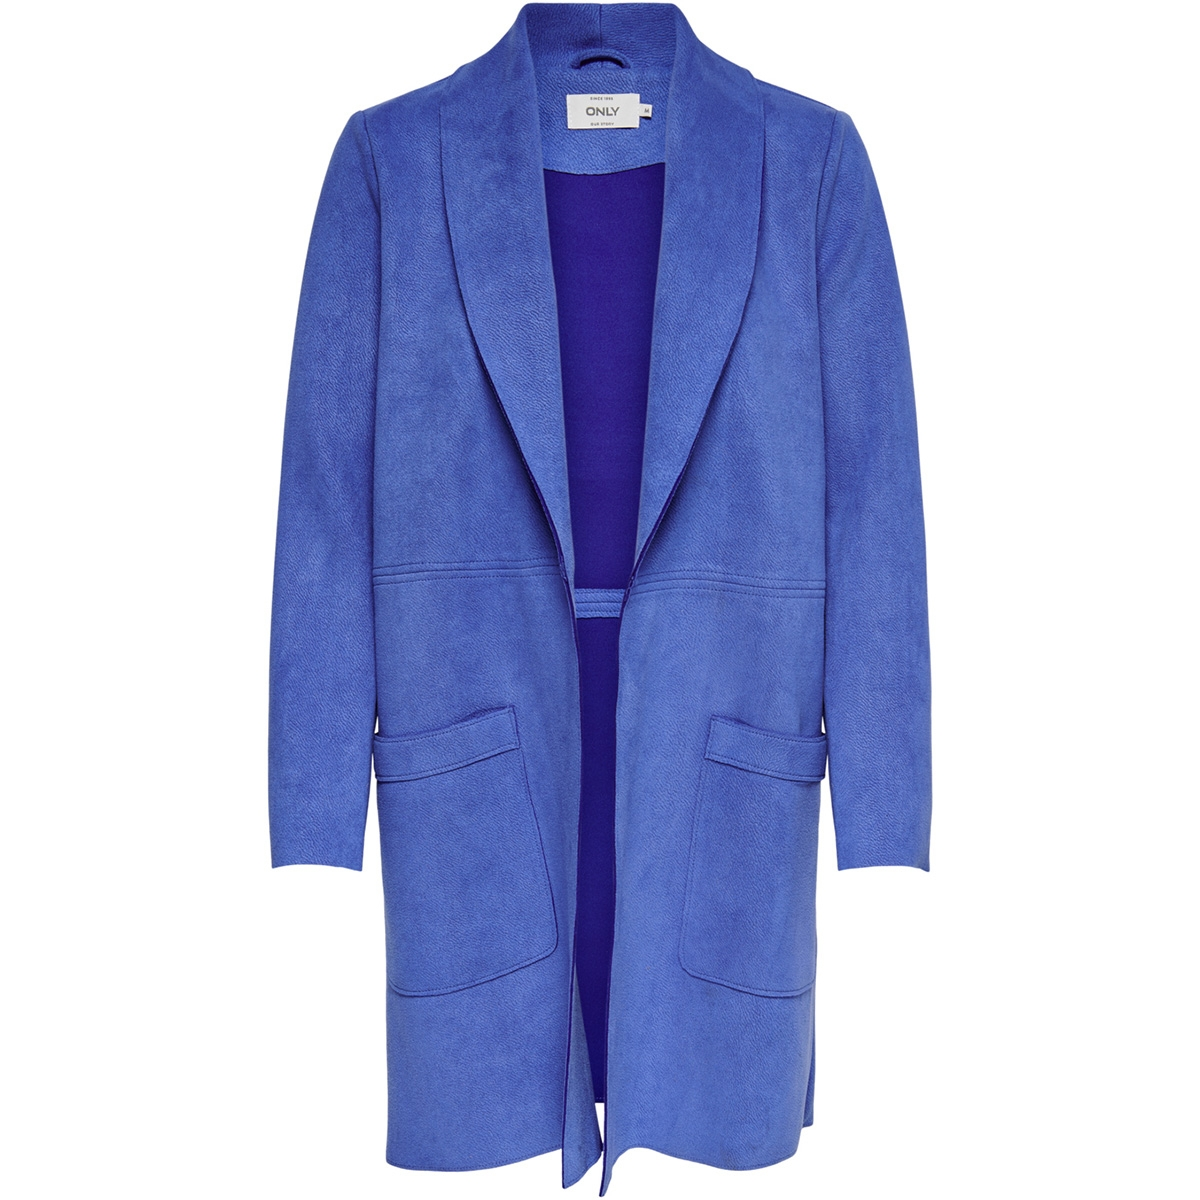 onljosephine faux suede coat otw 15158685 only jas dazzling blue